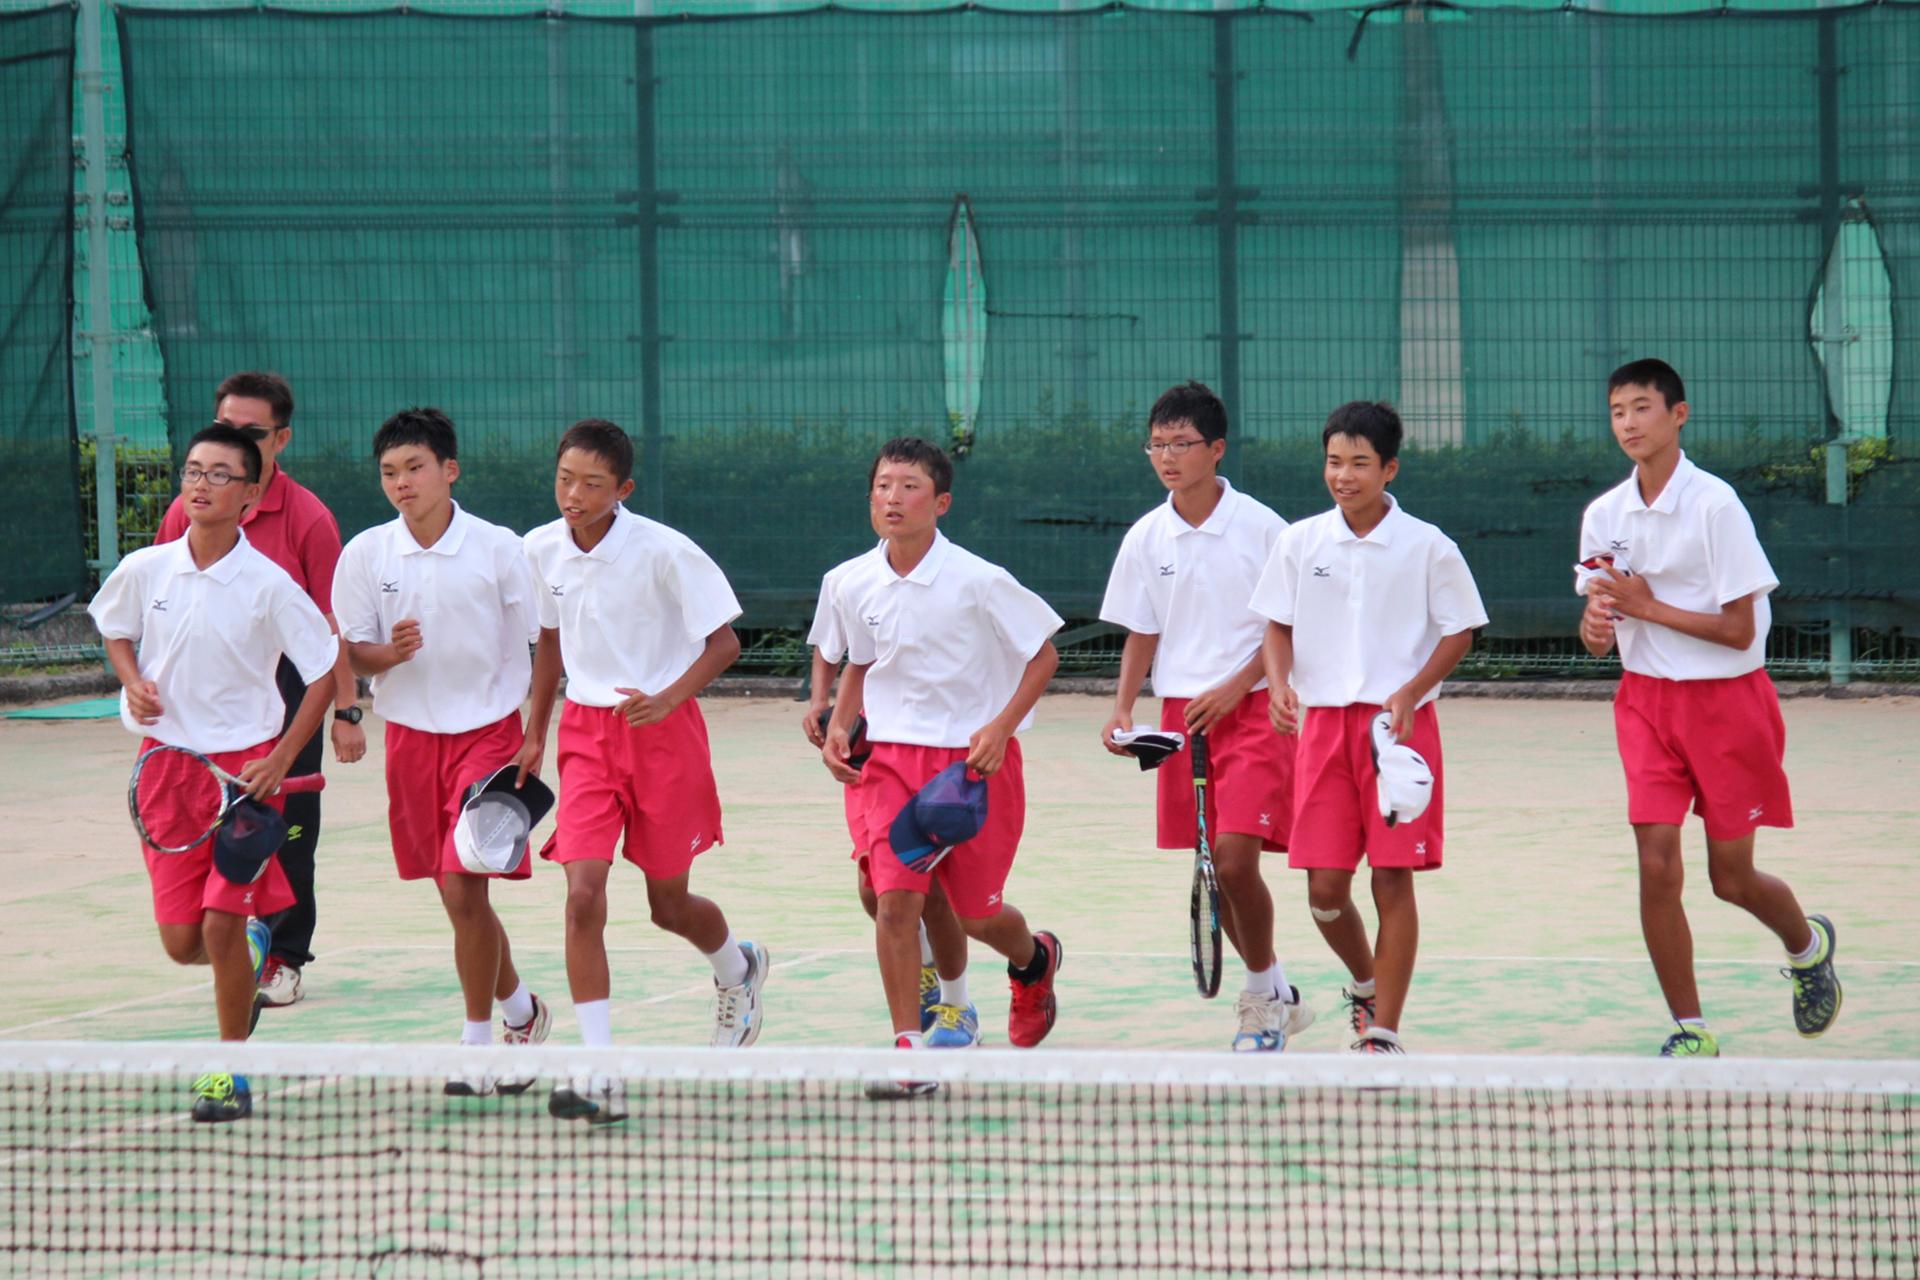 Tennis (87)